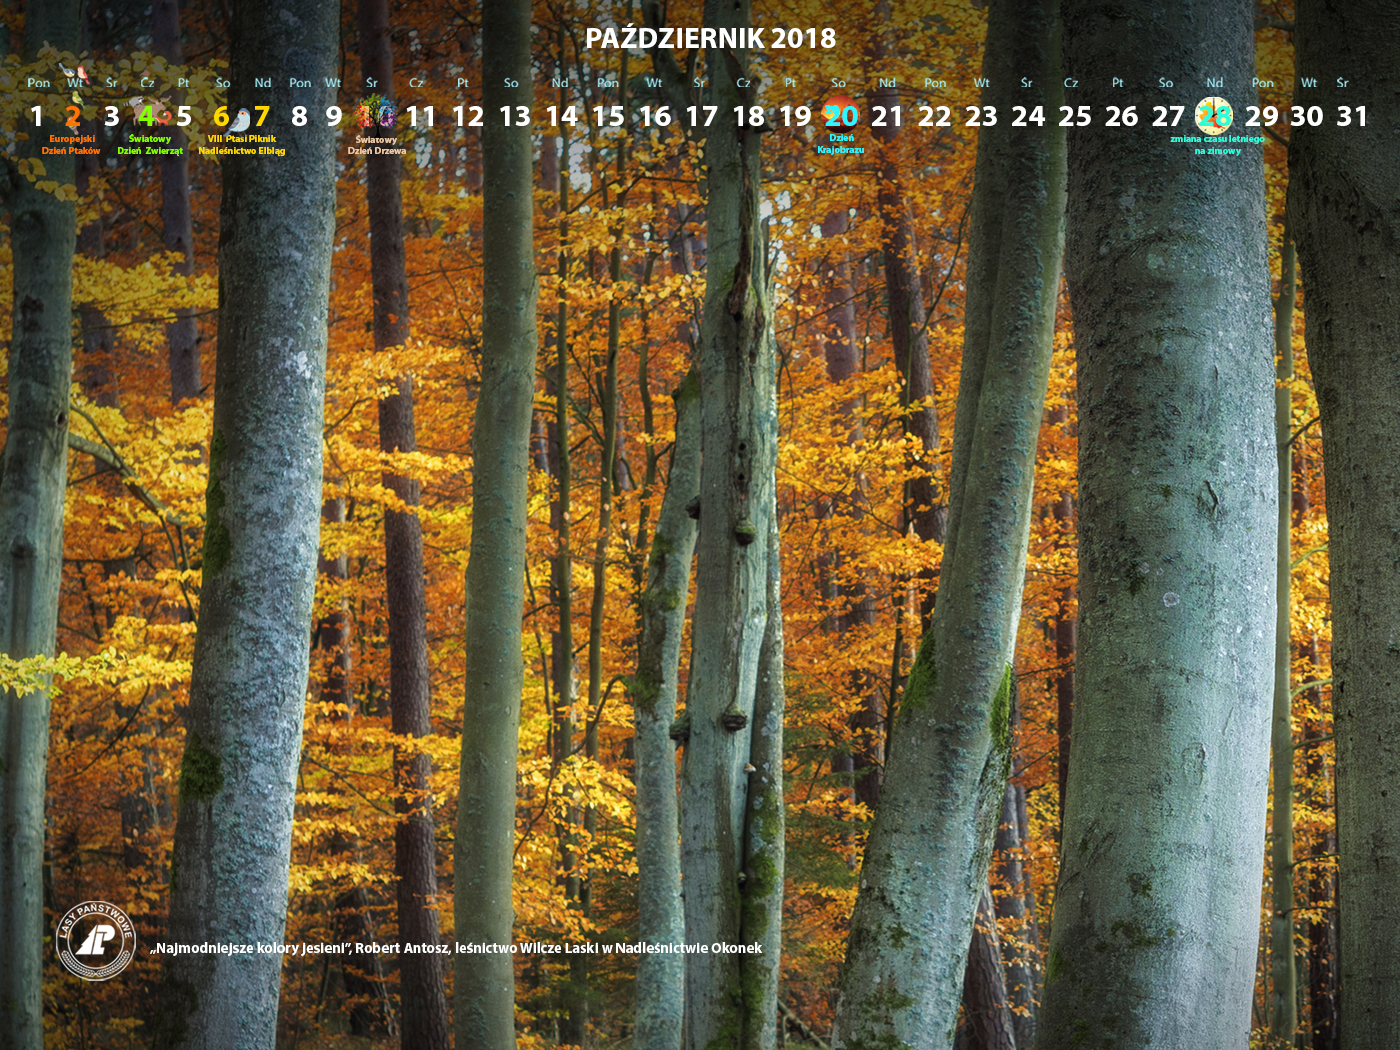 Kalendarz_październik_2018_1400x1050[1].jpg